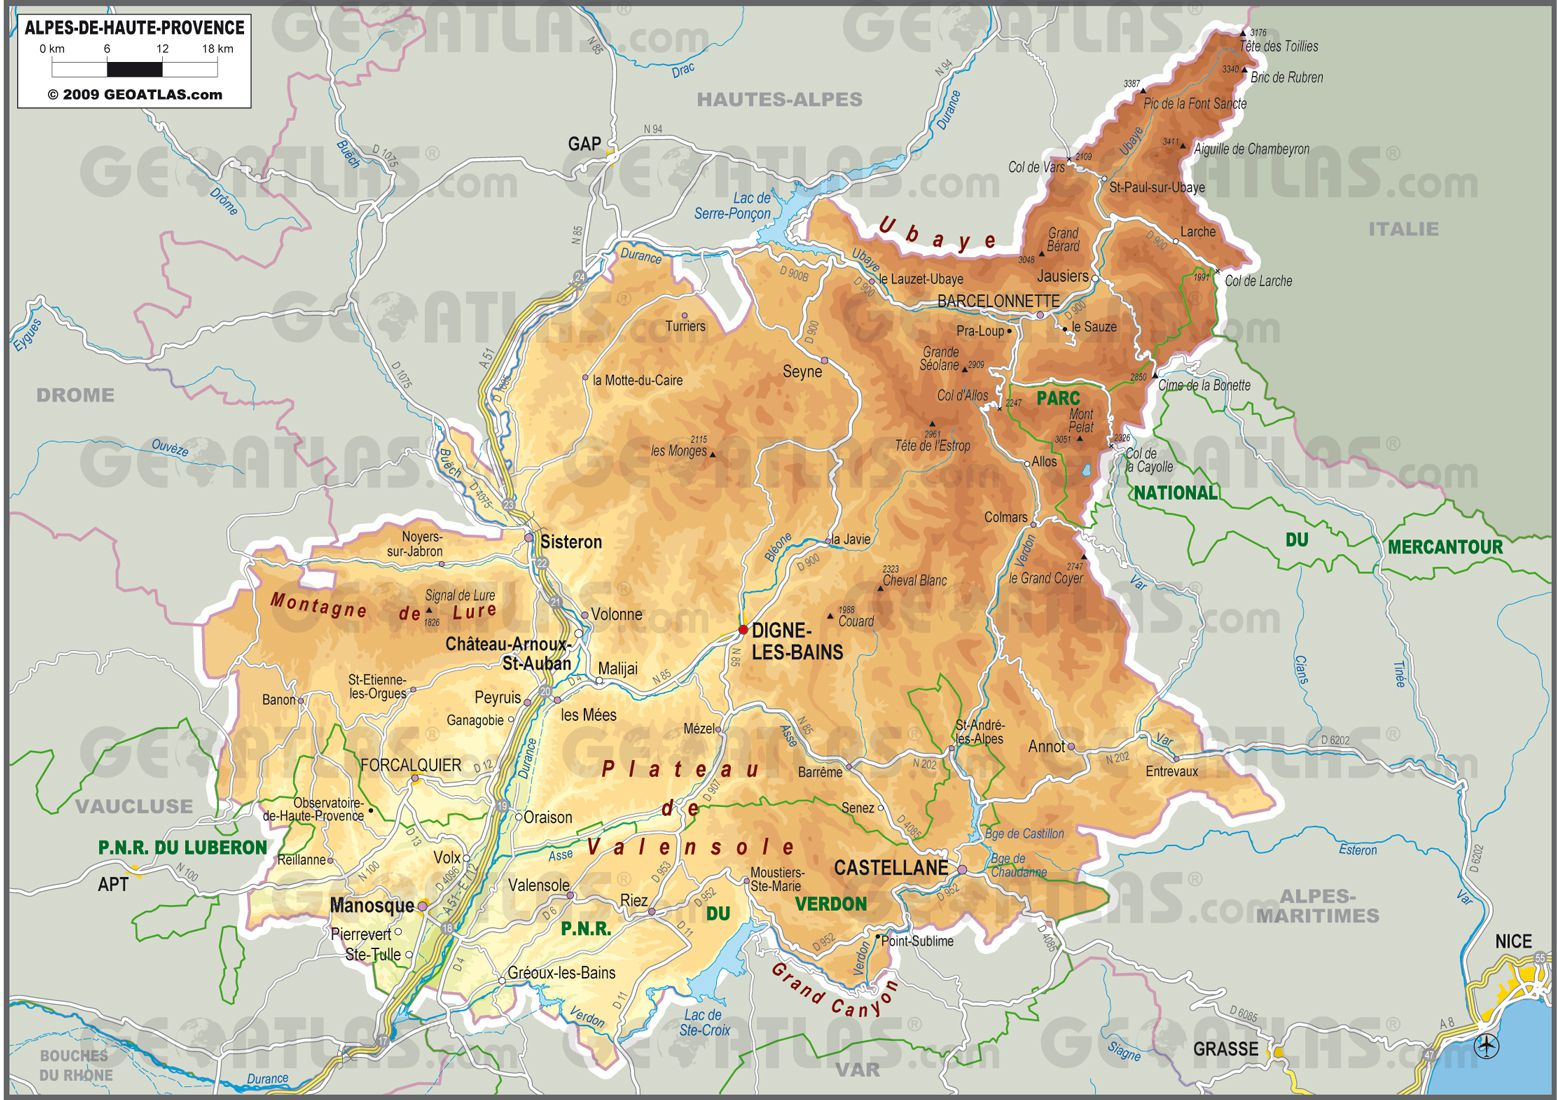 Alpes-de-Haute-Provence carte